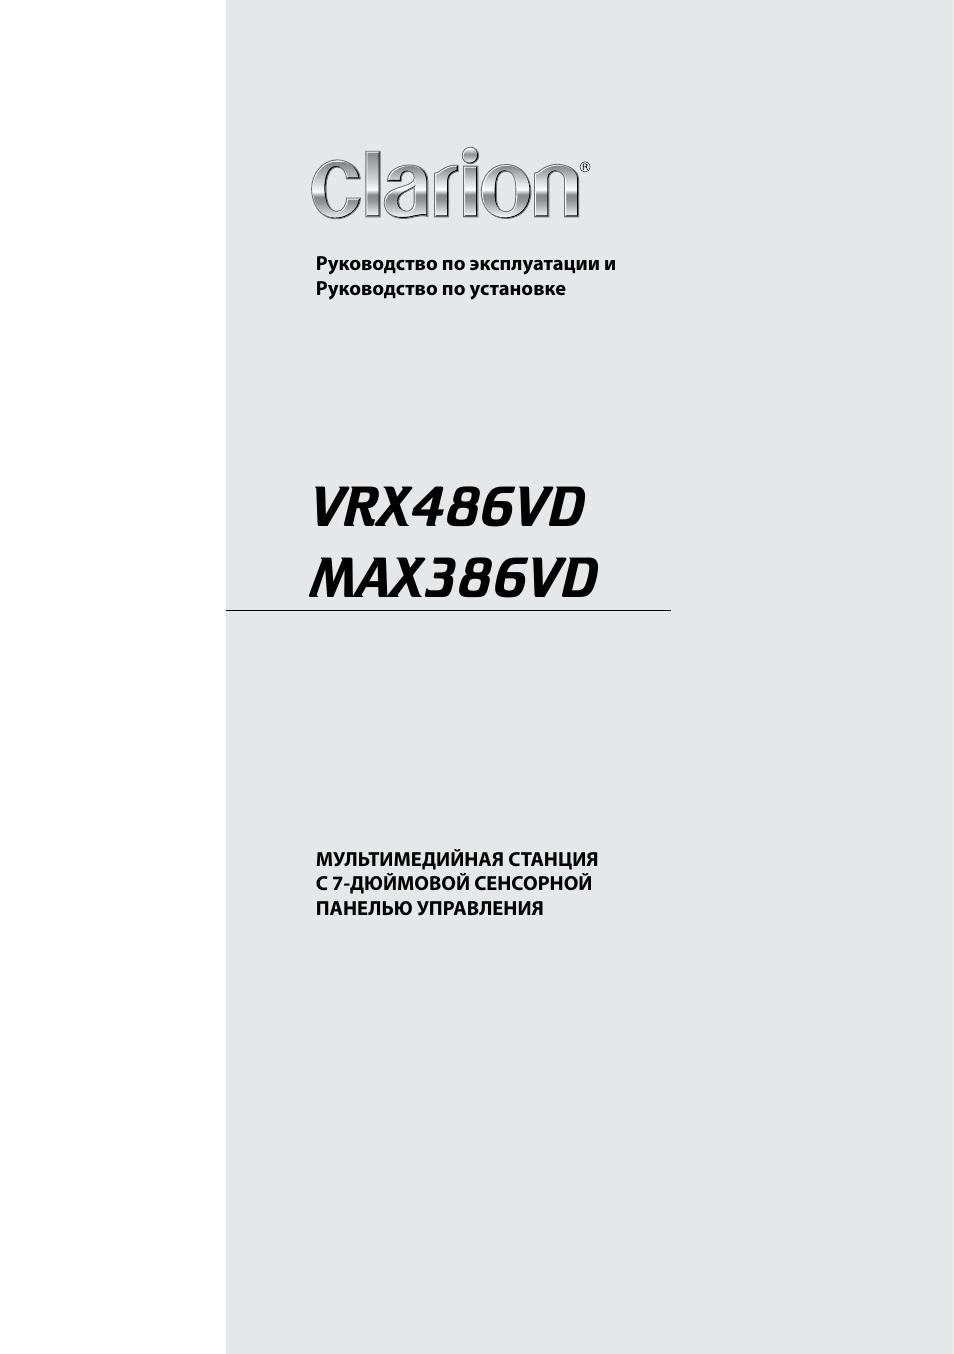 схема подключения магнитолы кларион мах385вд